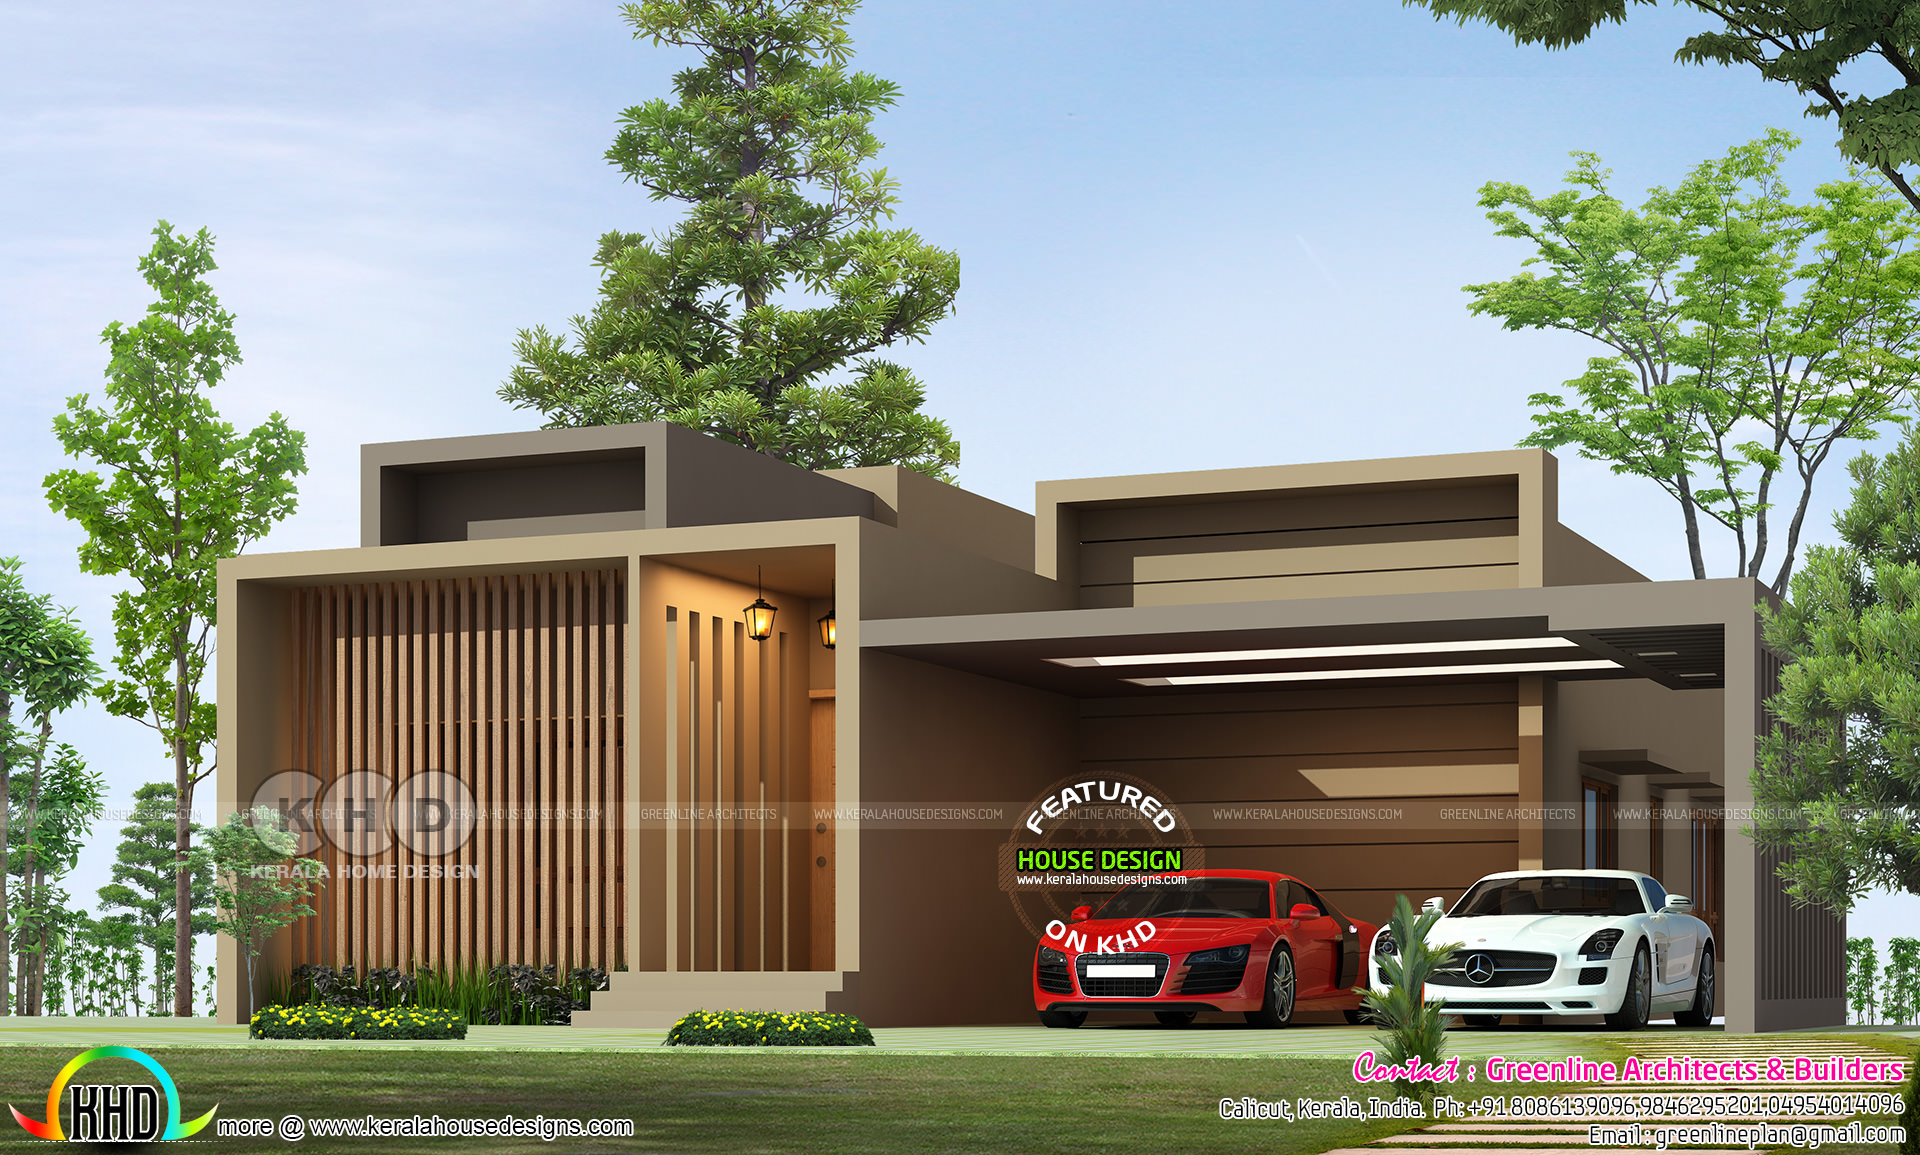 Box model single floor ultra modern home plan | Kerala home design on box home designs, box car modern house, box office designs, bridge house designs, birds house designs, harvest house designs,